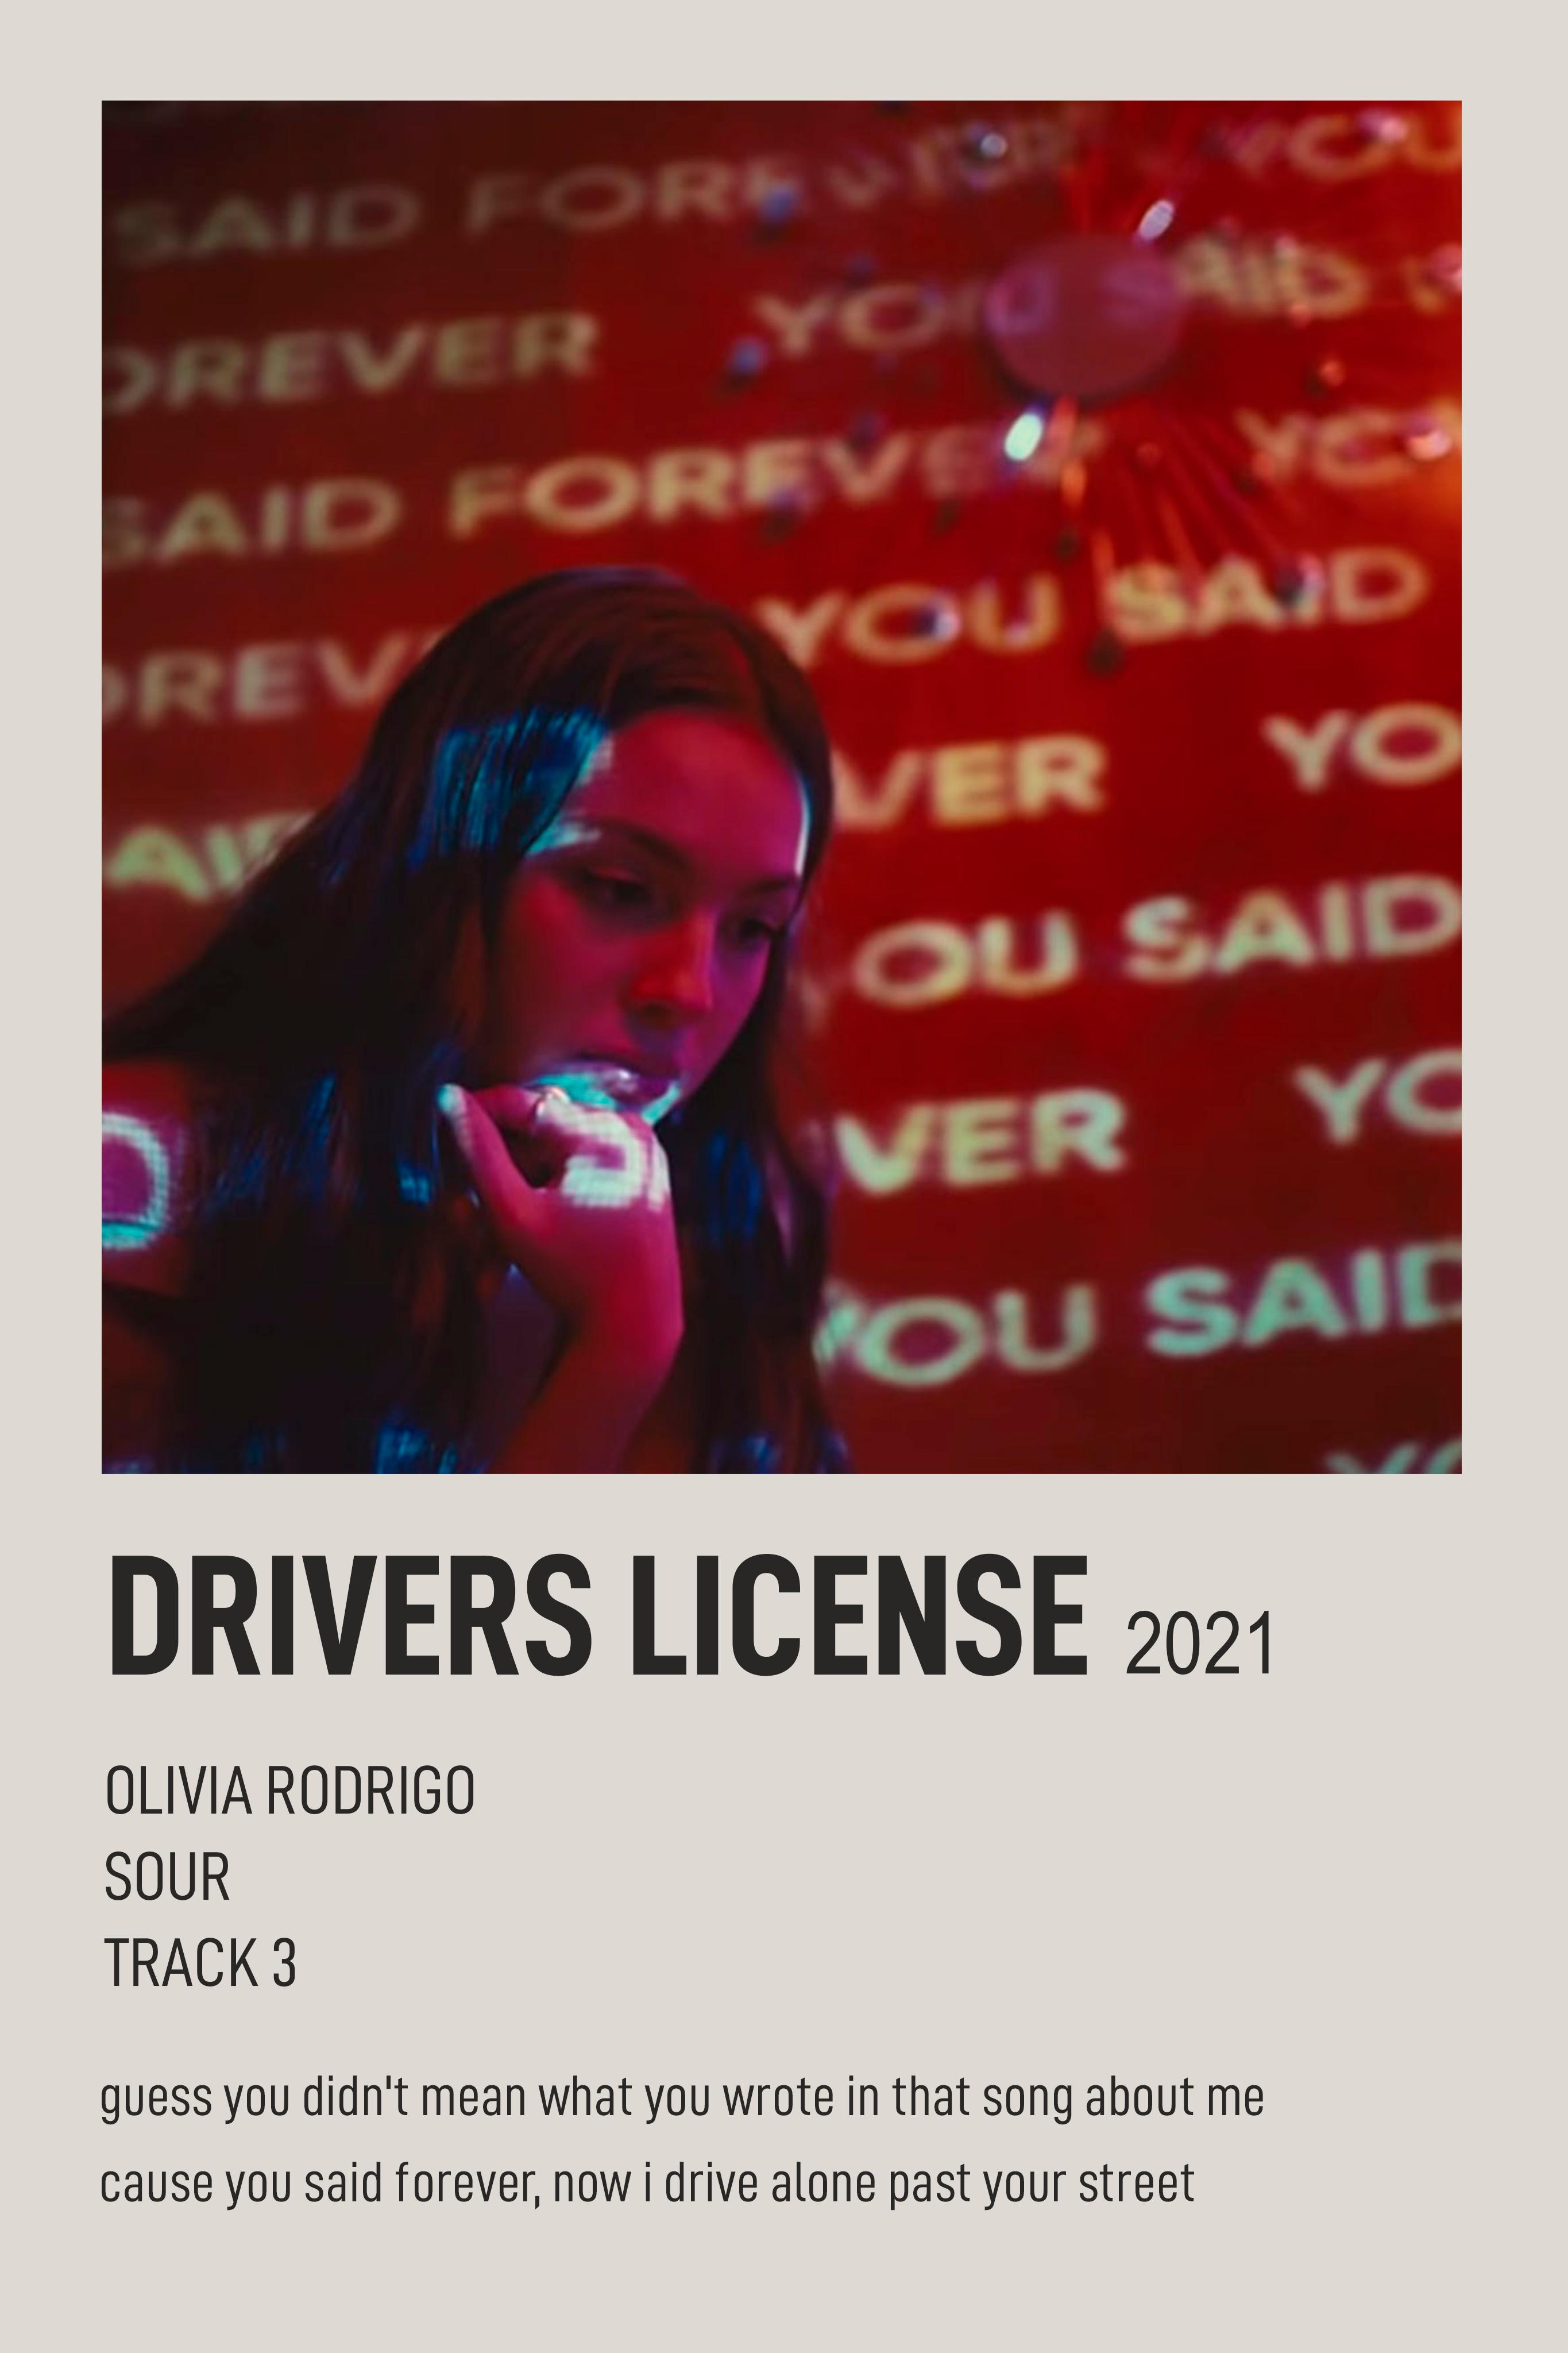 drivers license olivia rodrigo polaroid postcard